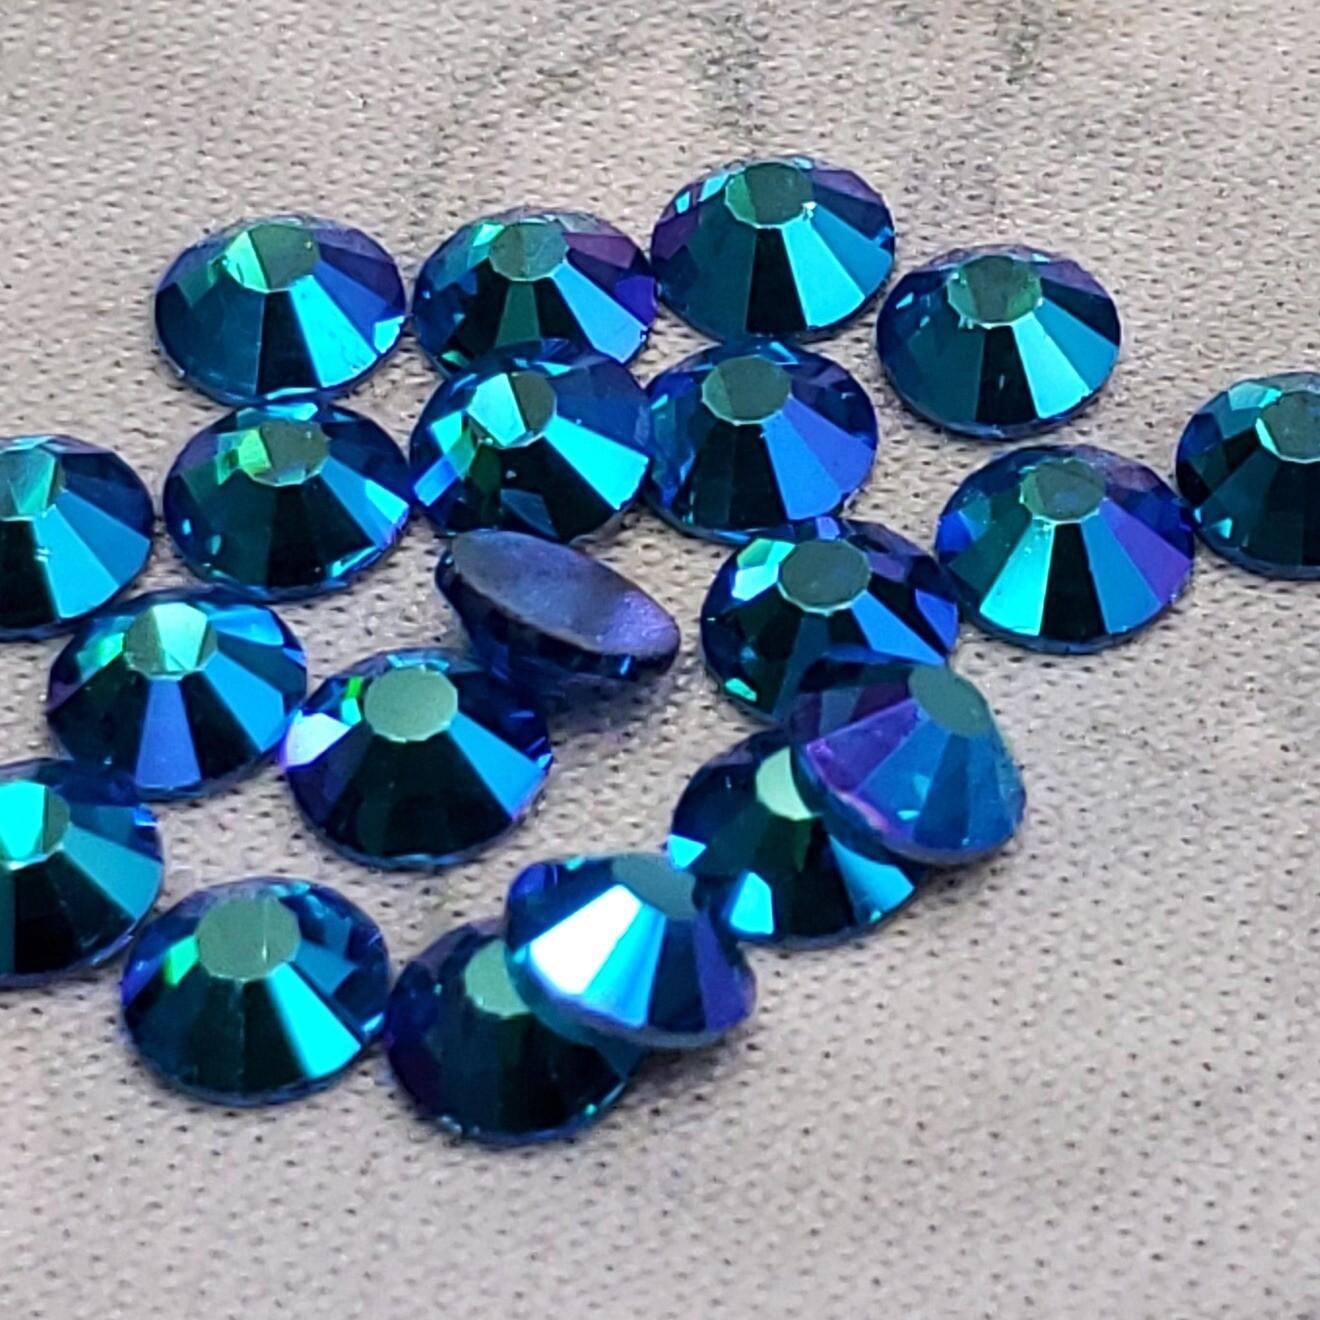 Capri AB - KiraKira Glass Rhinestones by CrystalNinja